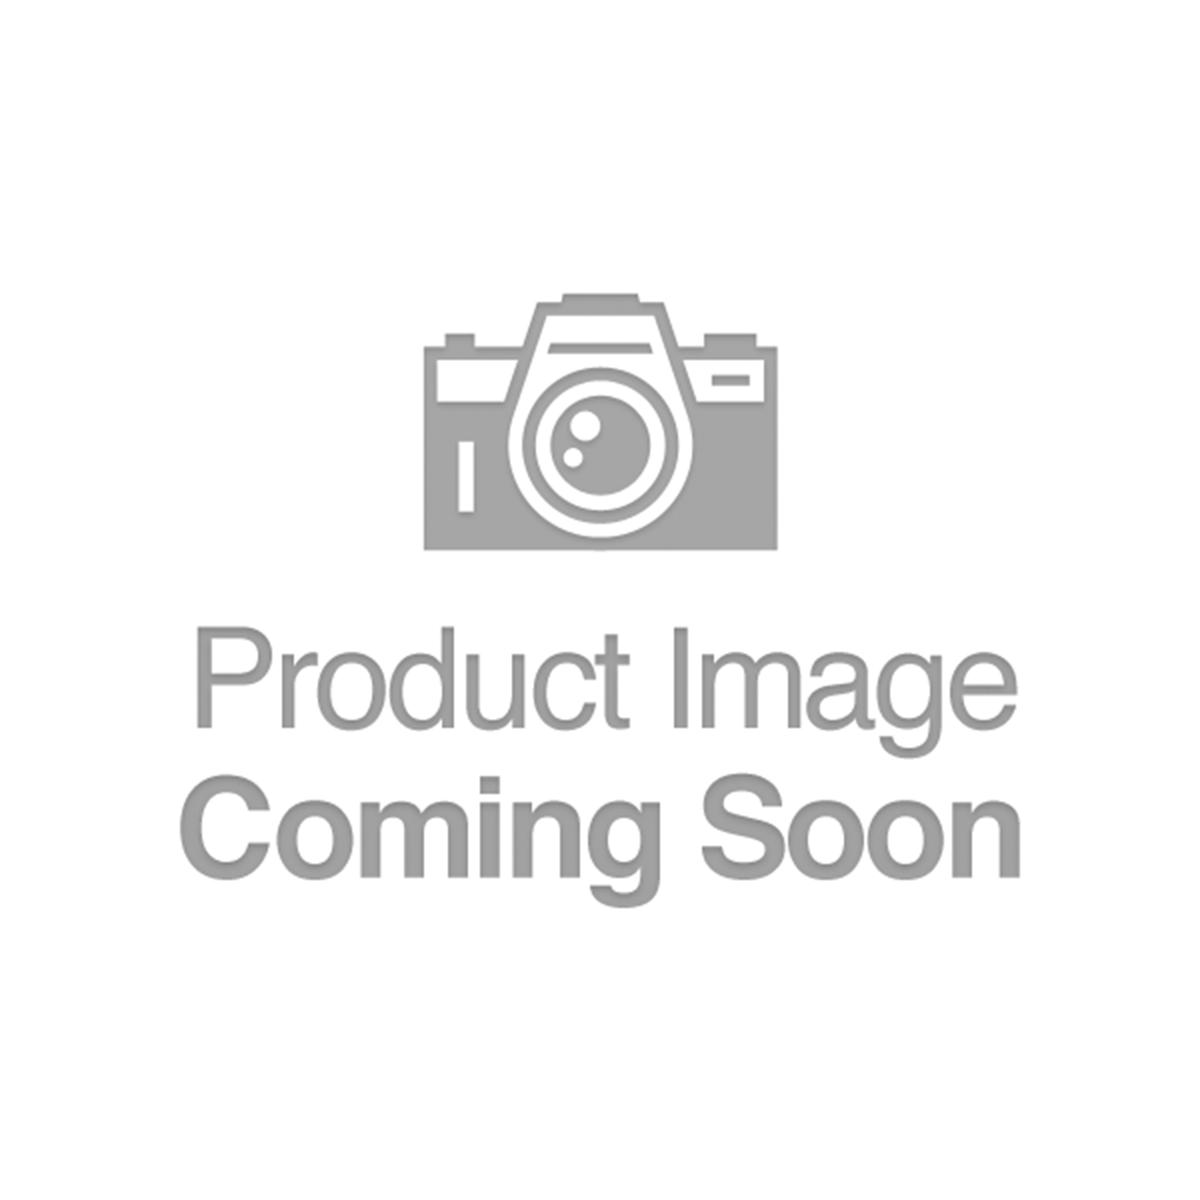 1866 5C With Rays Shield Nickel W/Rays PCGS MS65